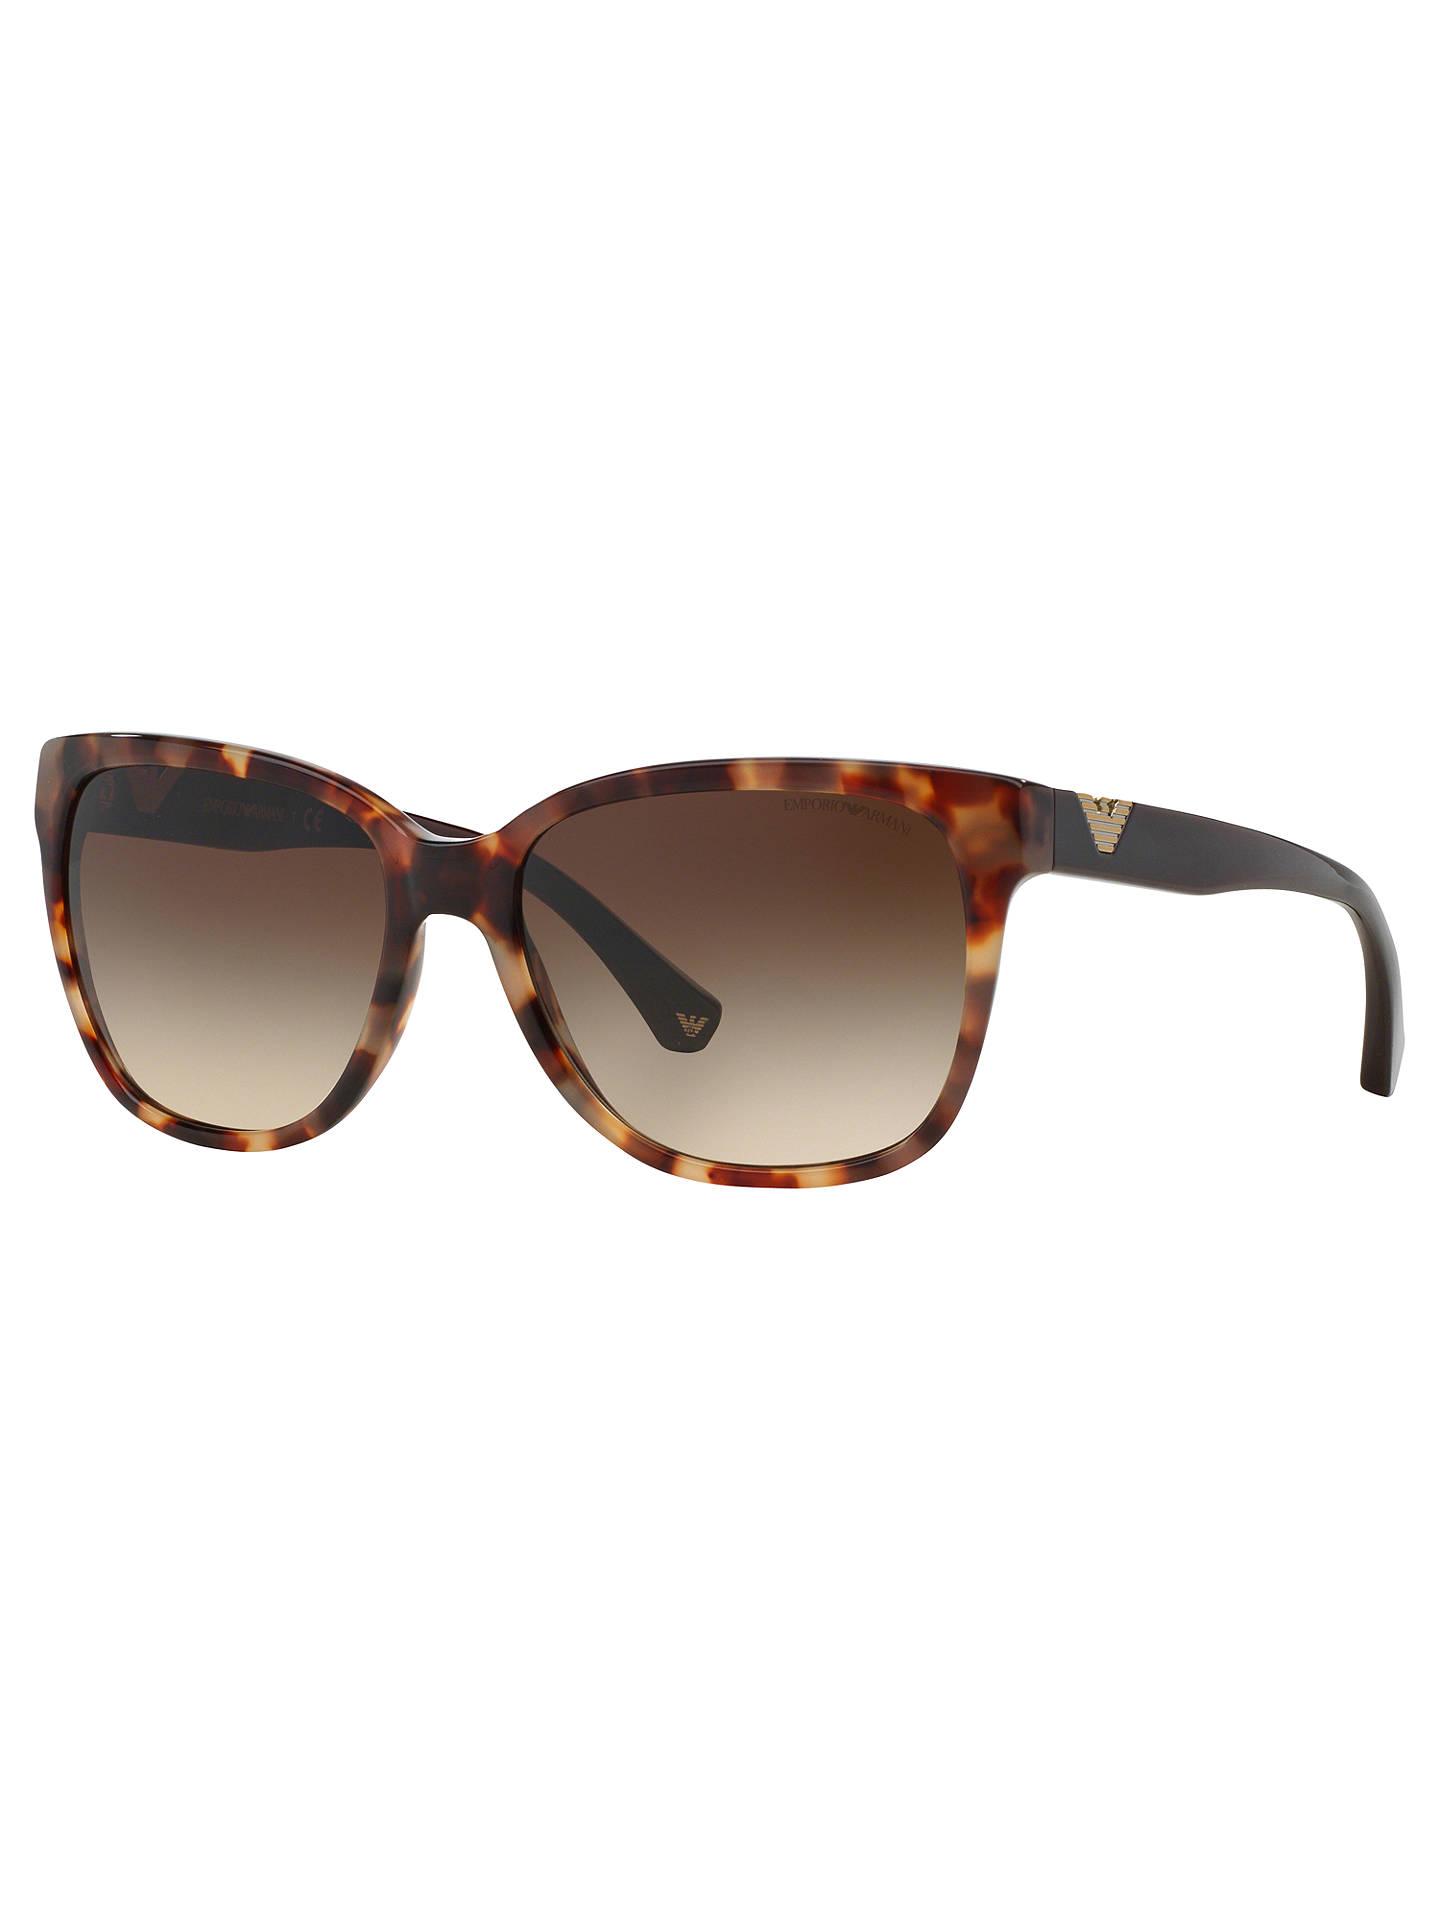 b070d16bd8 Buy Emporio Armani EA4038 Cat s Eye Sunglasses